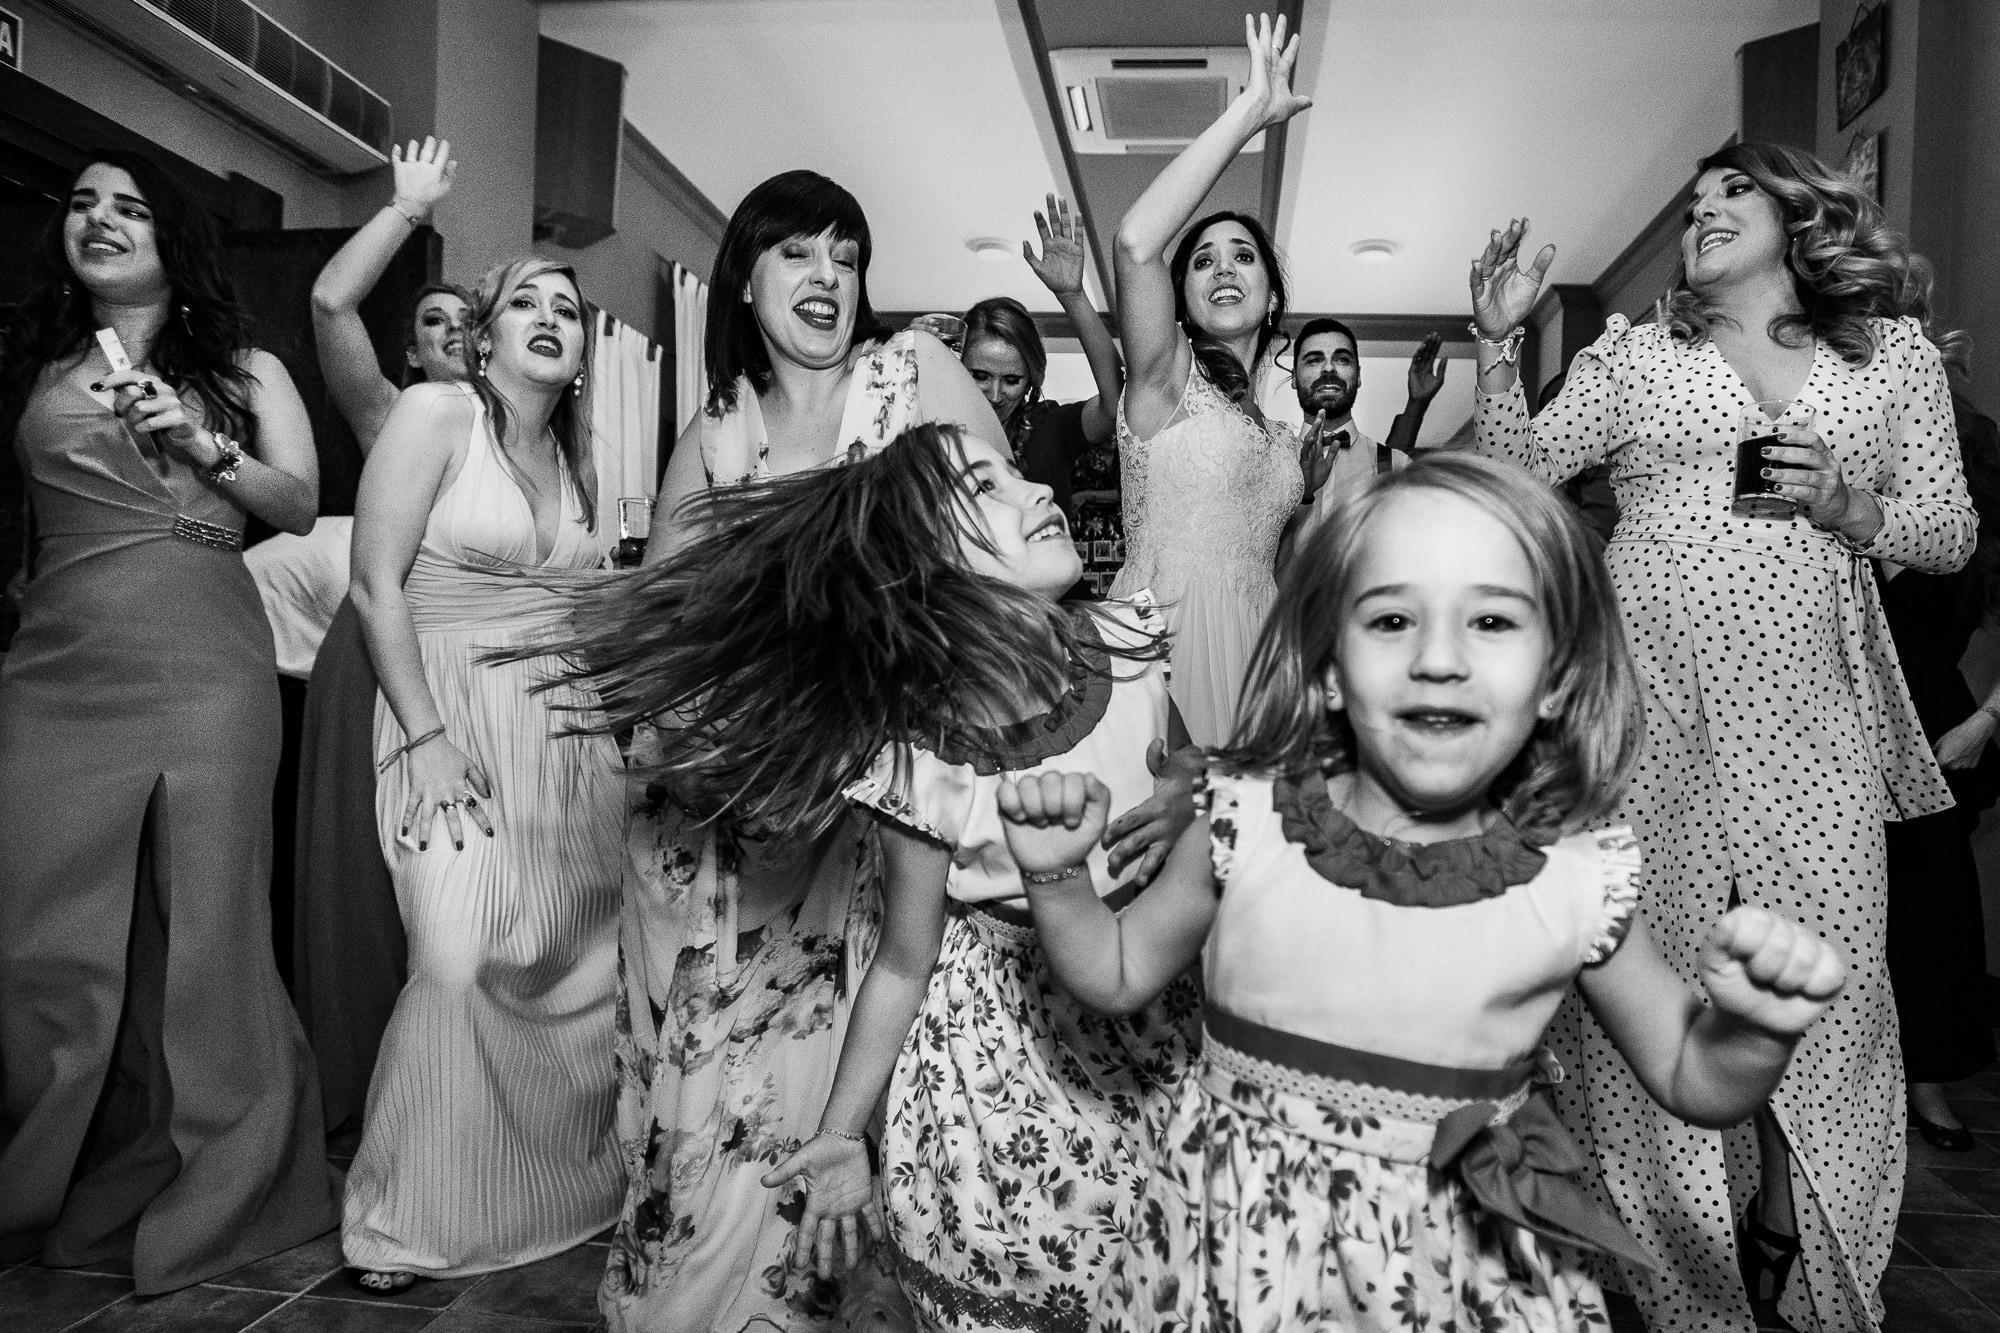 baile de novios en la boda